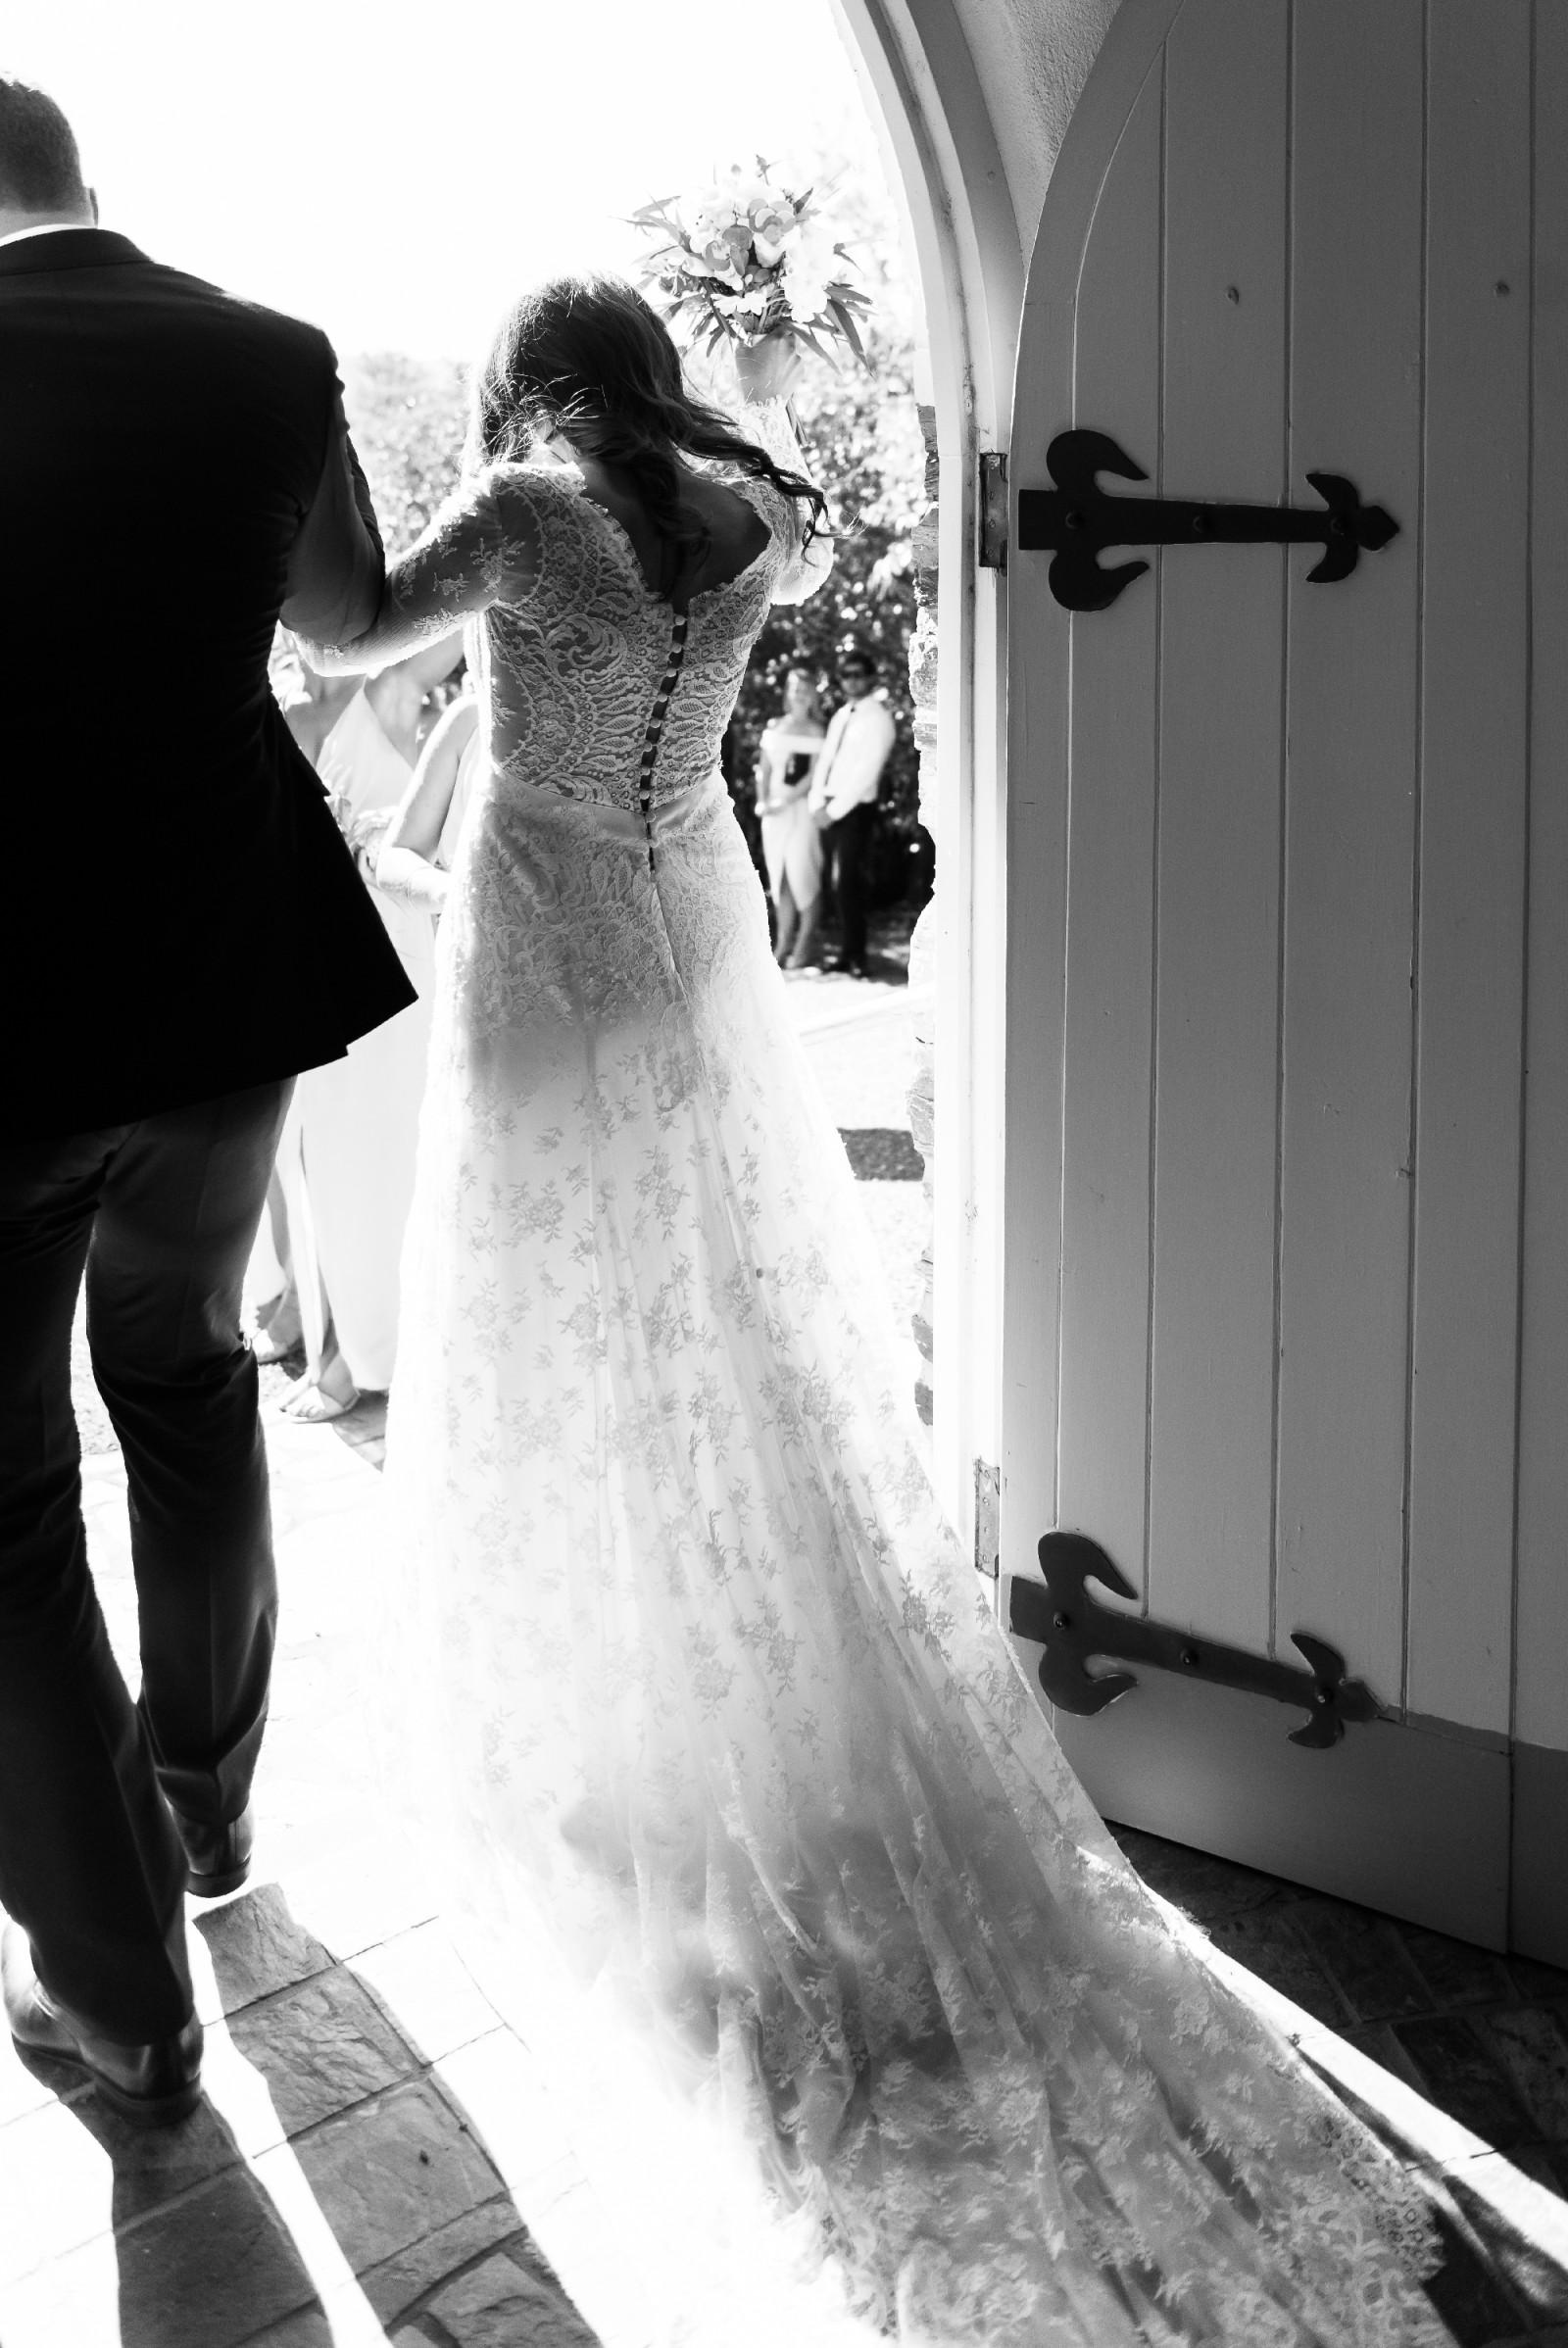 Carolina Herrera Claudette Used Wedding Dress Save 71%